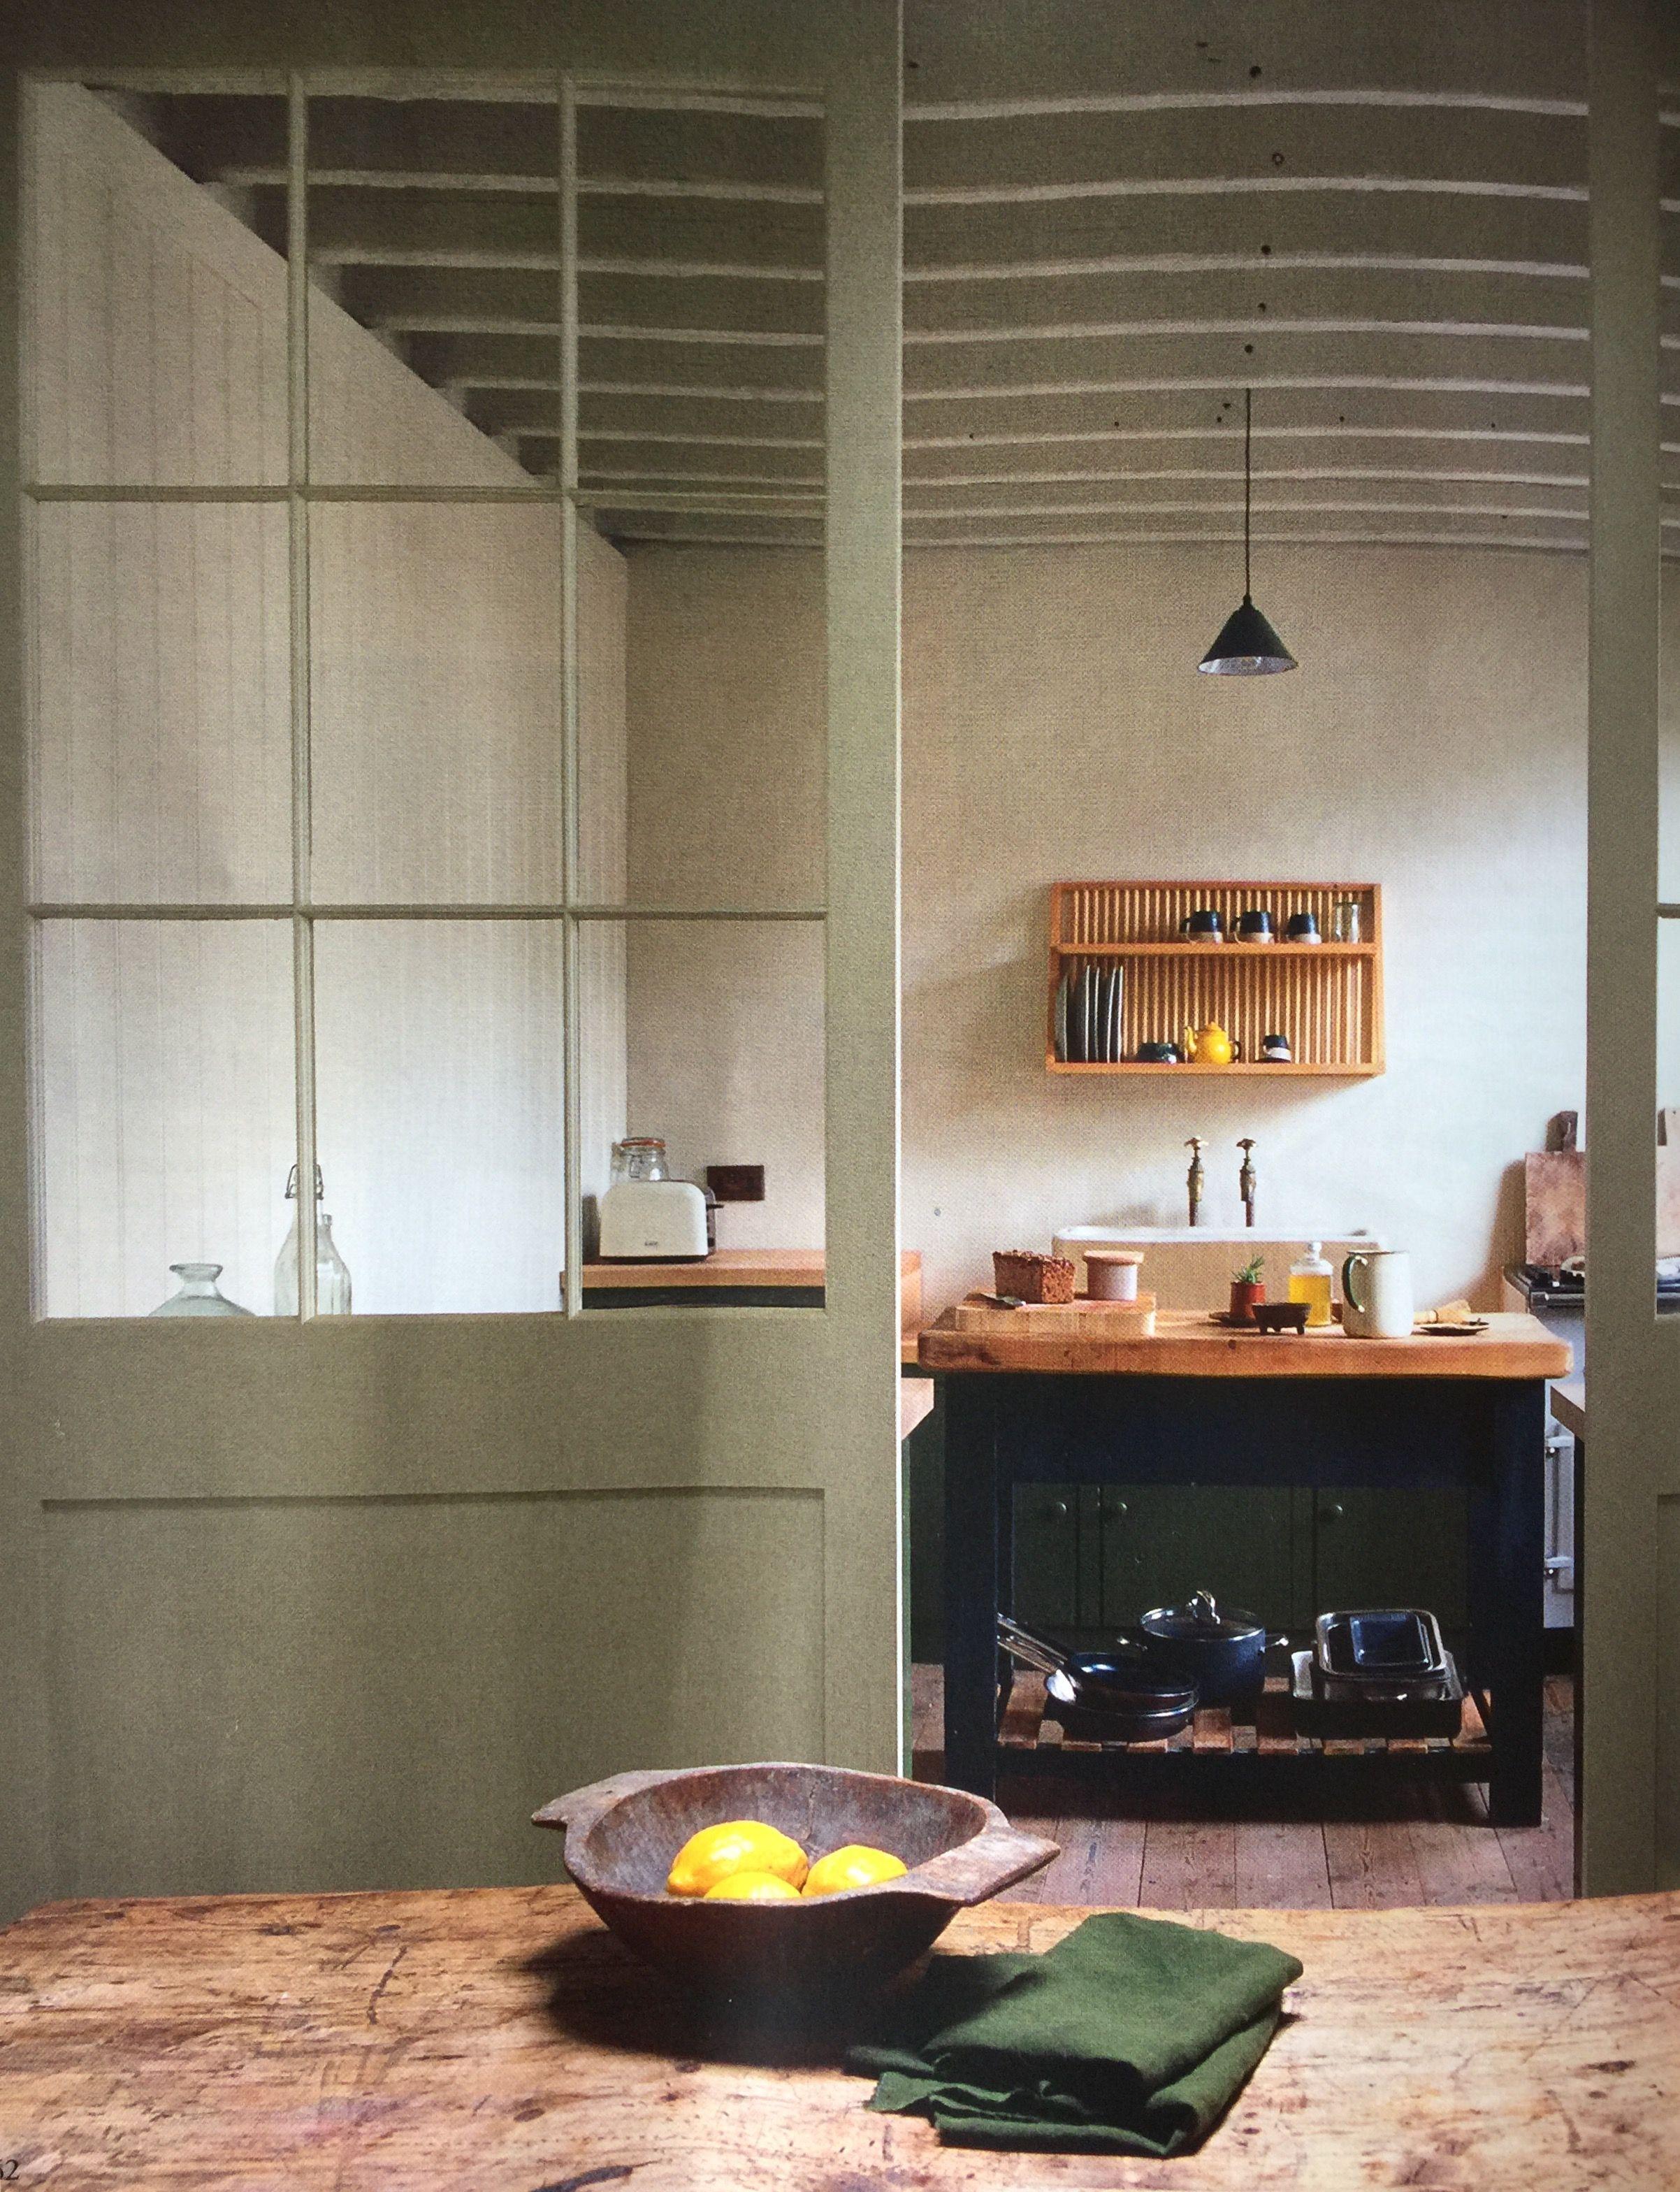 stuart shave london home plain english kitchen the art of less copy world of interiors. Black Bedroom Furniture Sets. Home Design Ideas